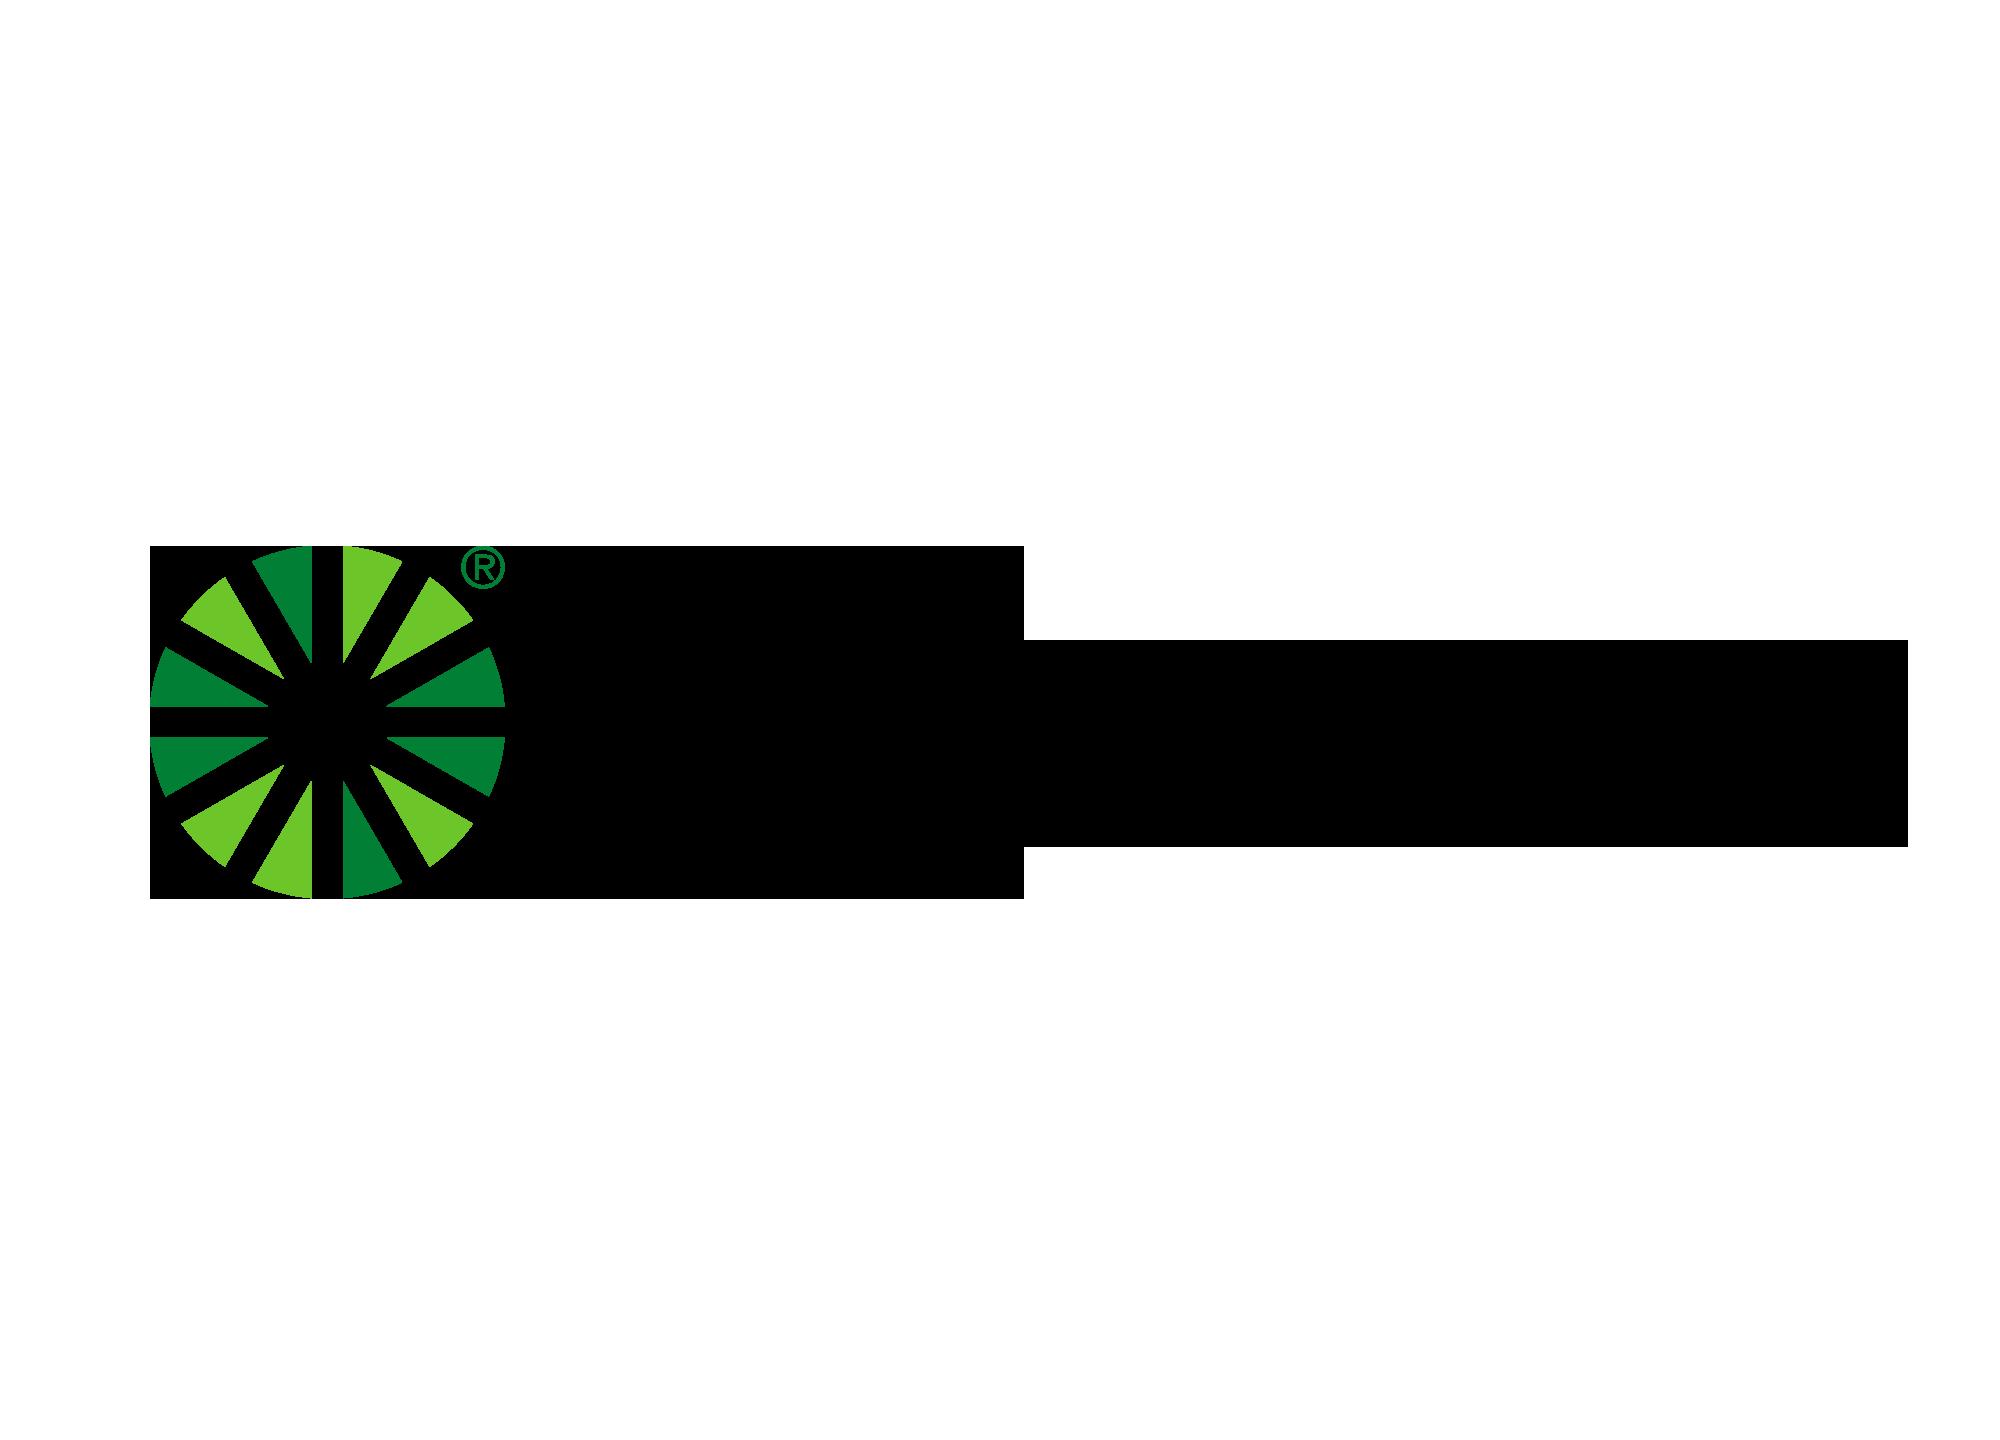 ap_610048291547 - CenturyLink logo_231083